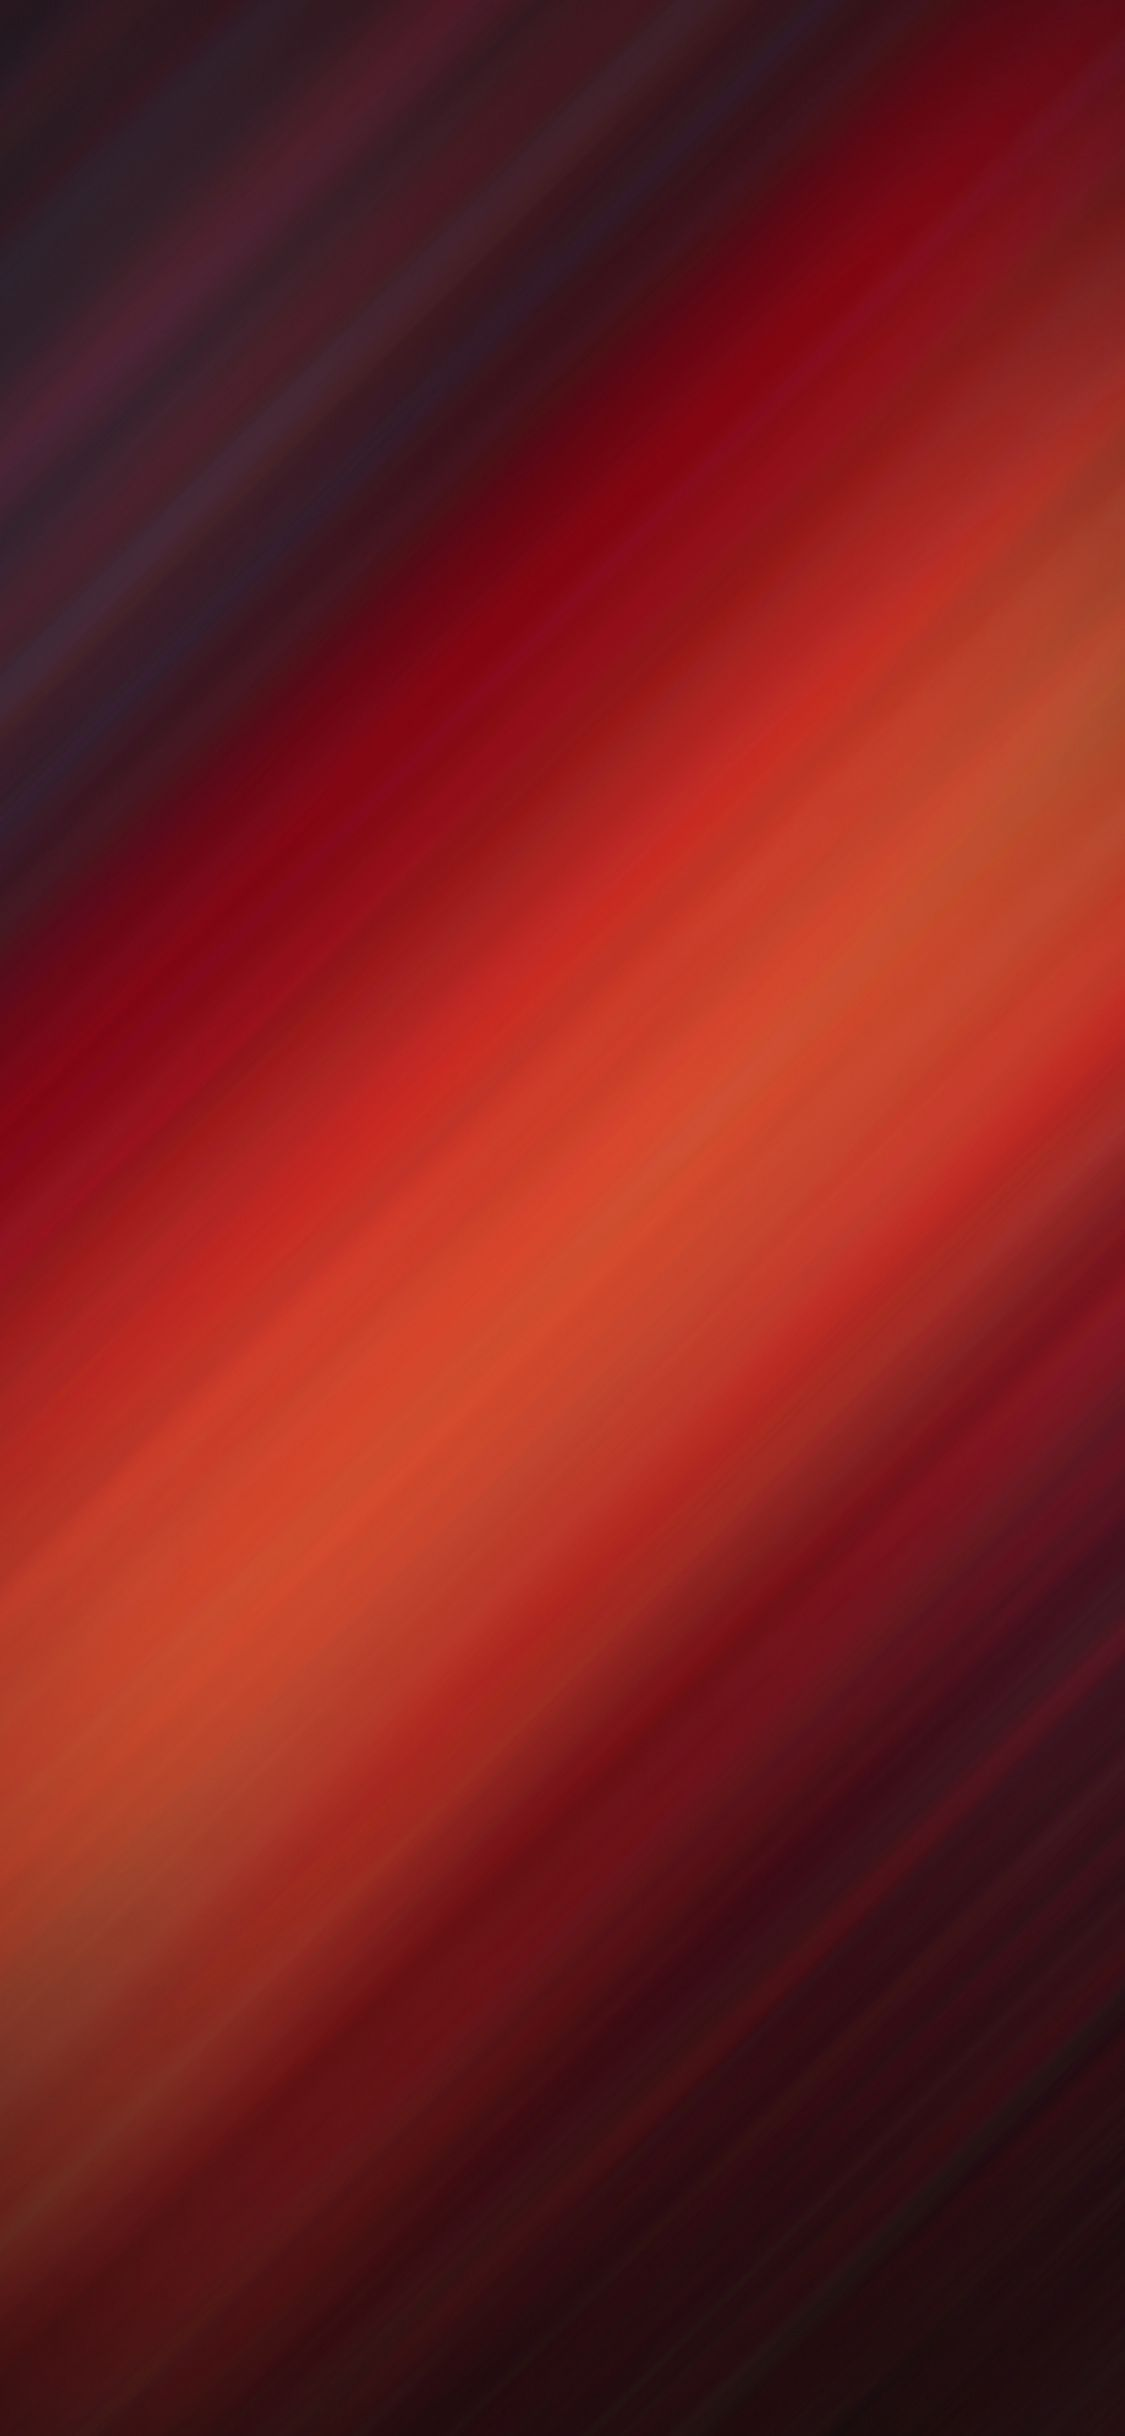 1125x2436 Gradient Stripes Dark Red Blur Wallpaper Red Wallpaper Sunset Wallpaper Wallpaper